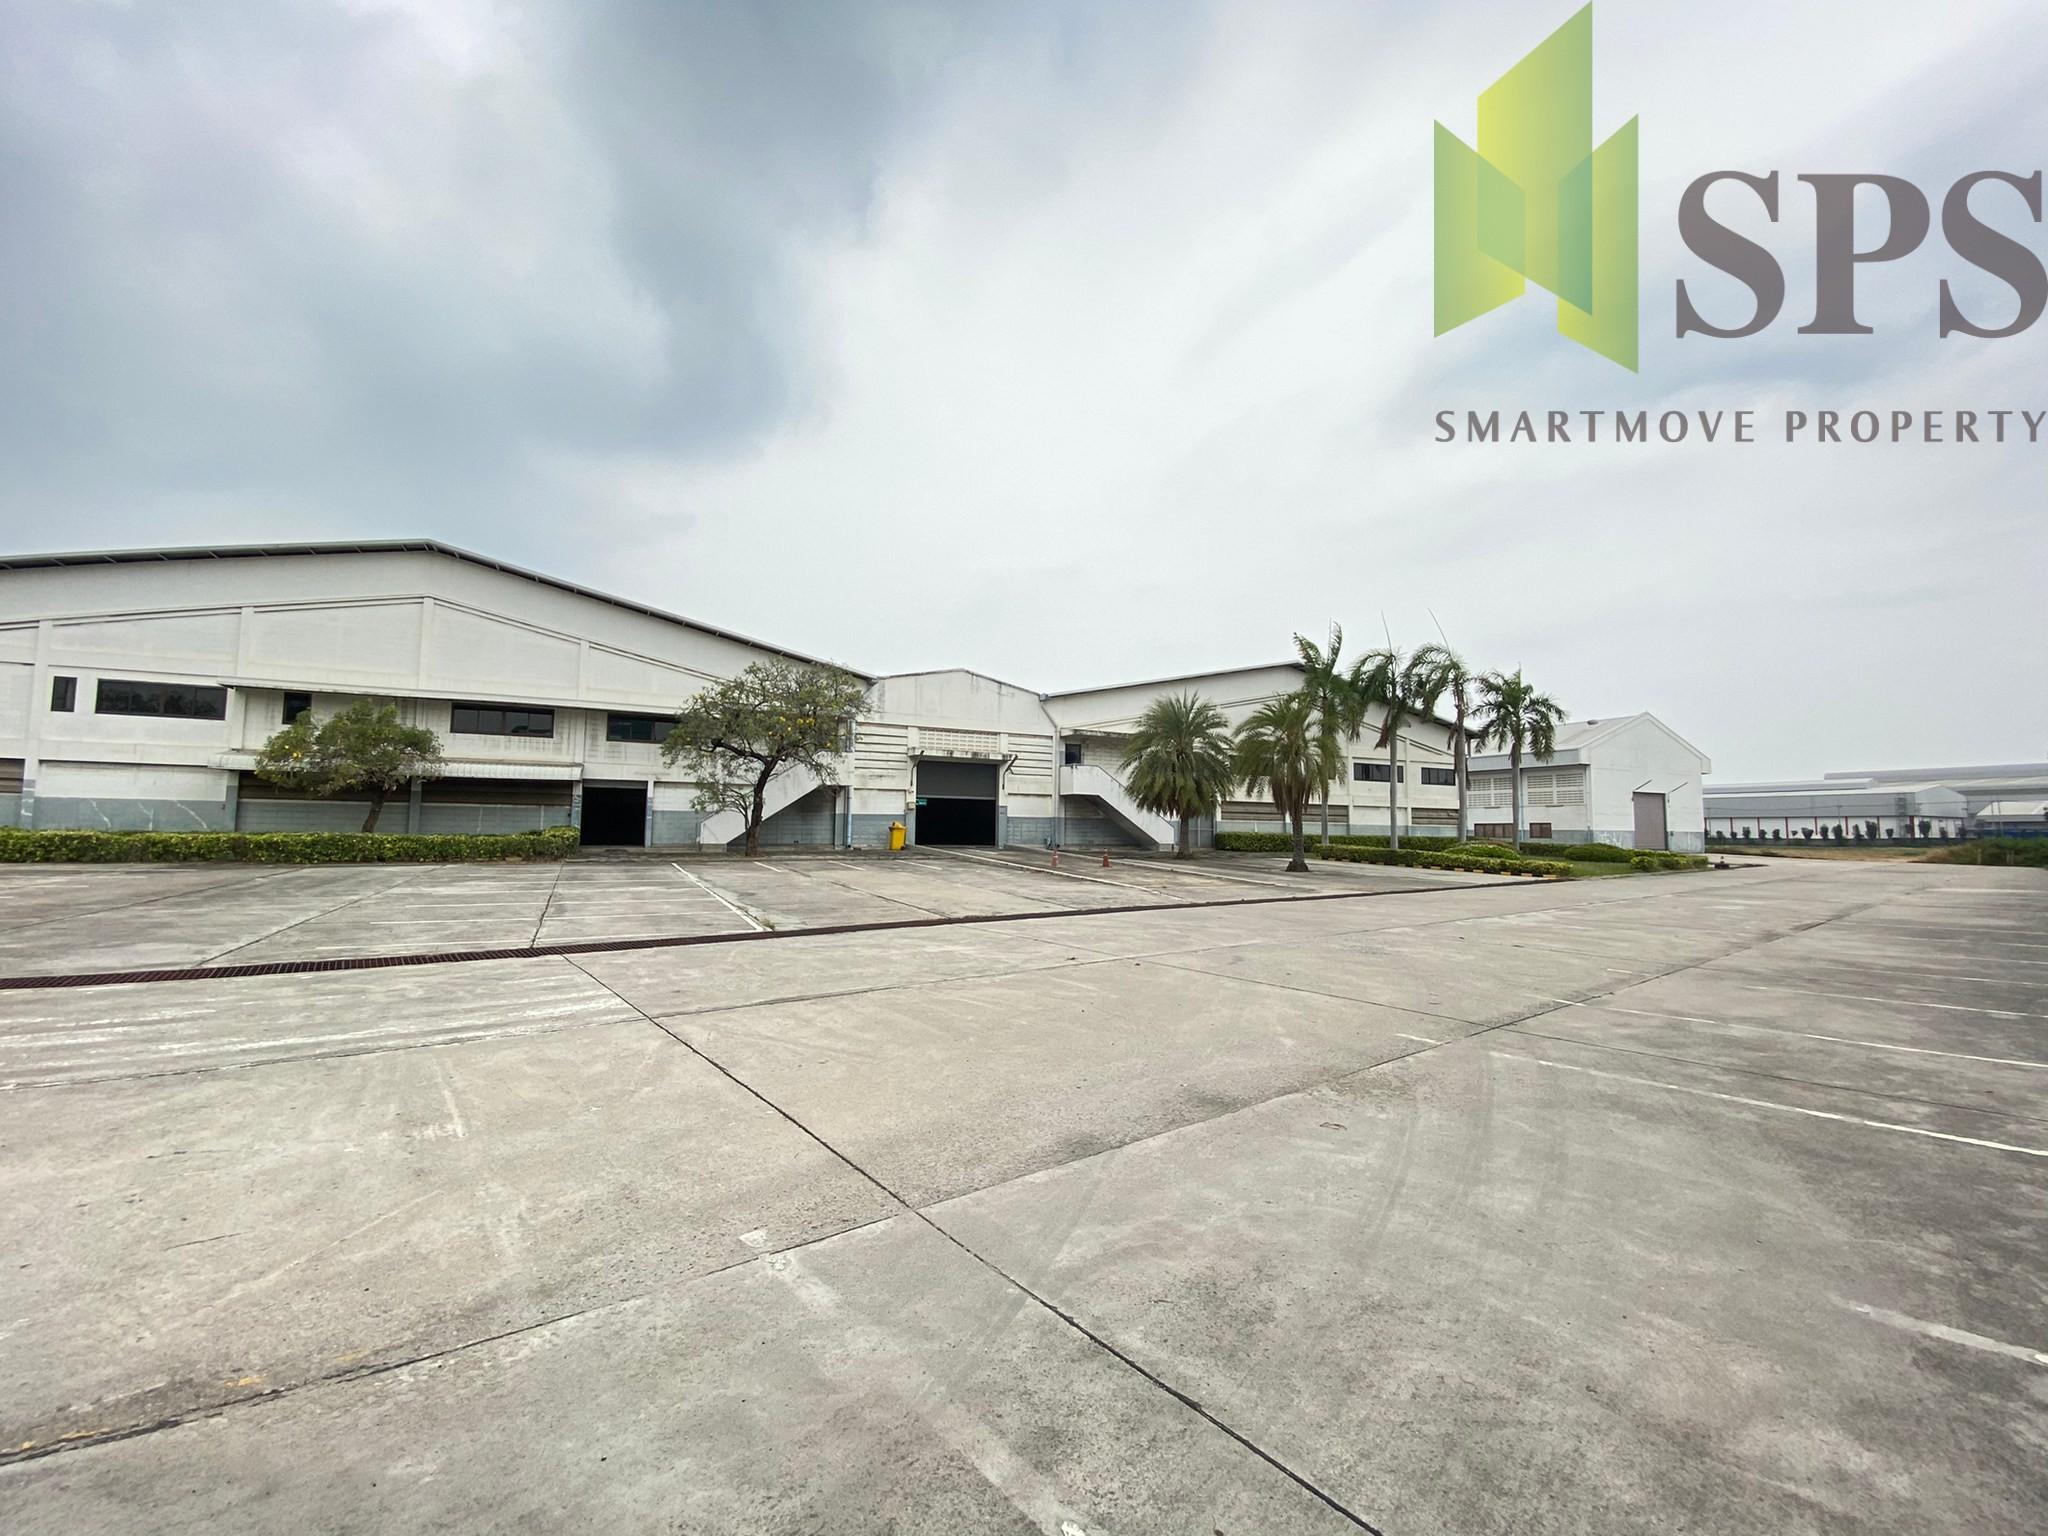 Factory/Warehouse with Office for RENT at Bangna-Trad Road KM.23/ โรงงาน, โกดัง พร้อมสำนักงาน สำหรับเช่า ที่ บางนา ตราด กม 23(Property ID: SPS-PPW164)